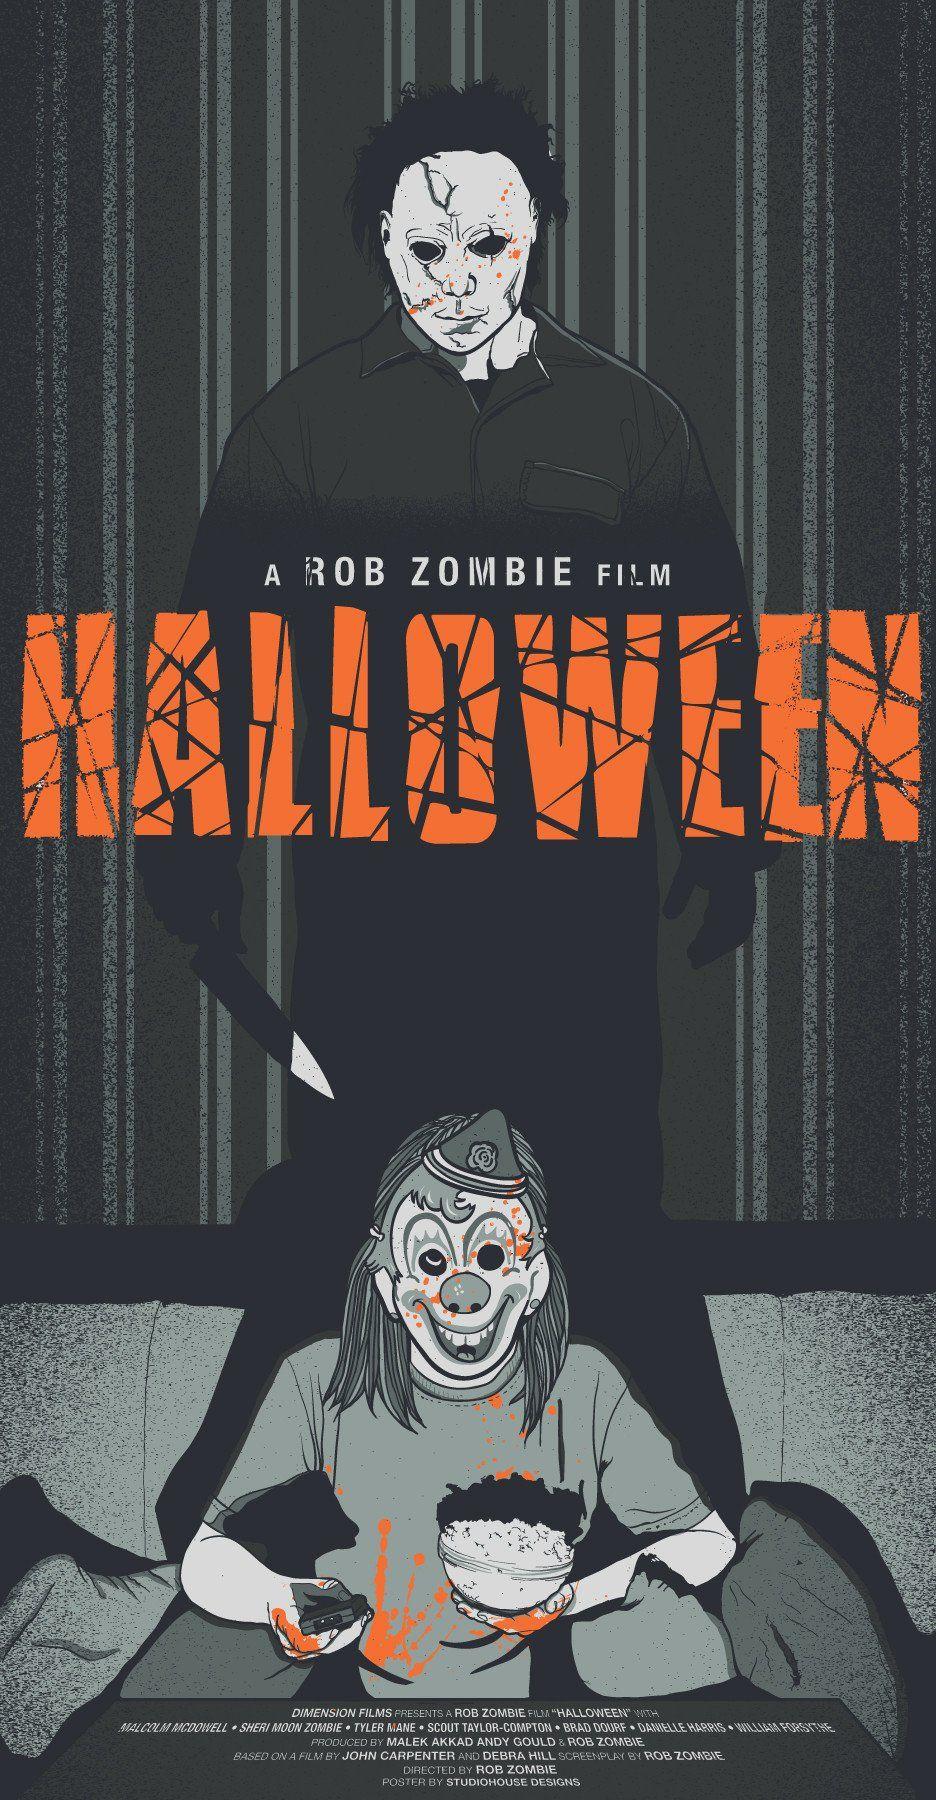 Halloween Halloween film, Rob zombie, Halloween movies